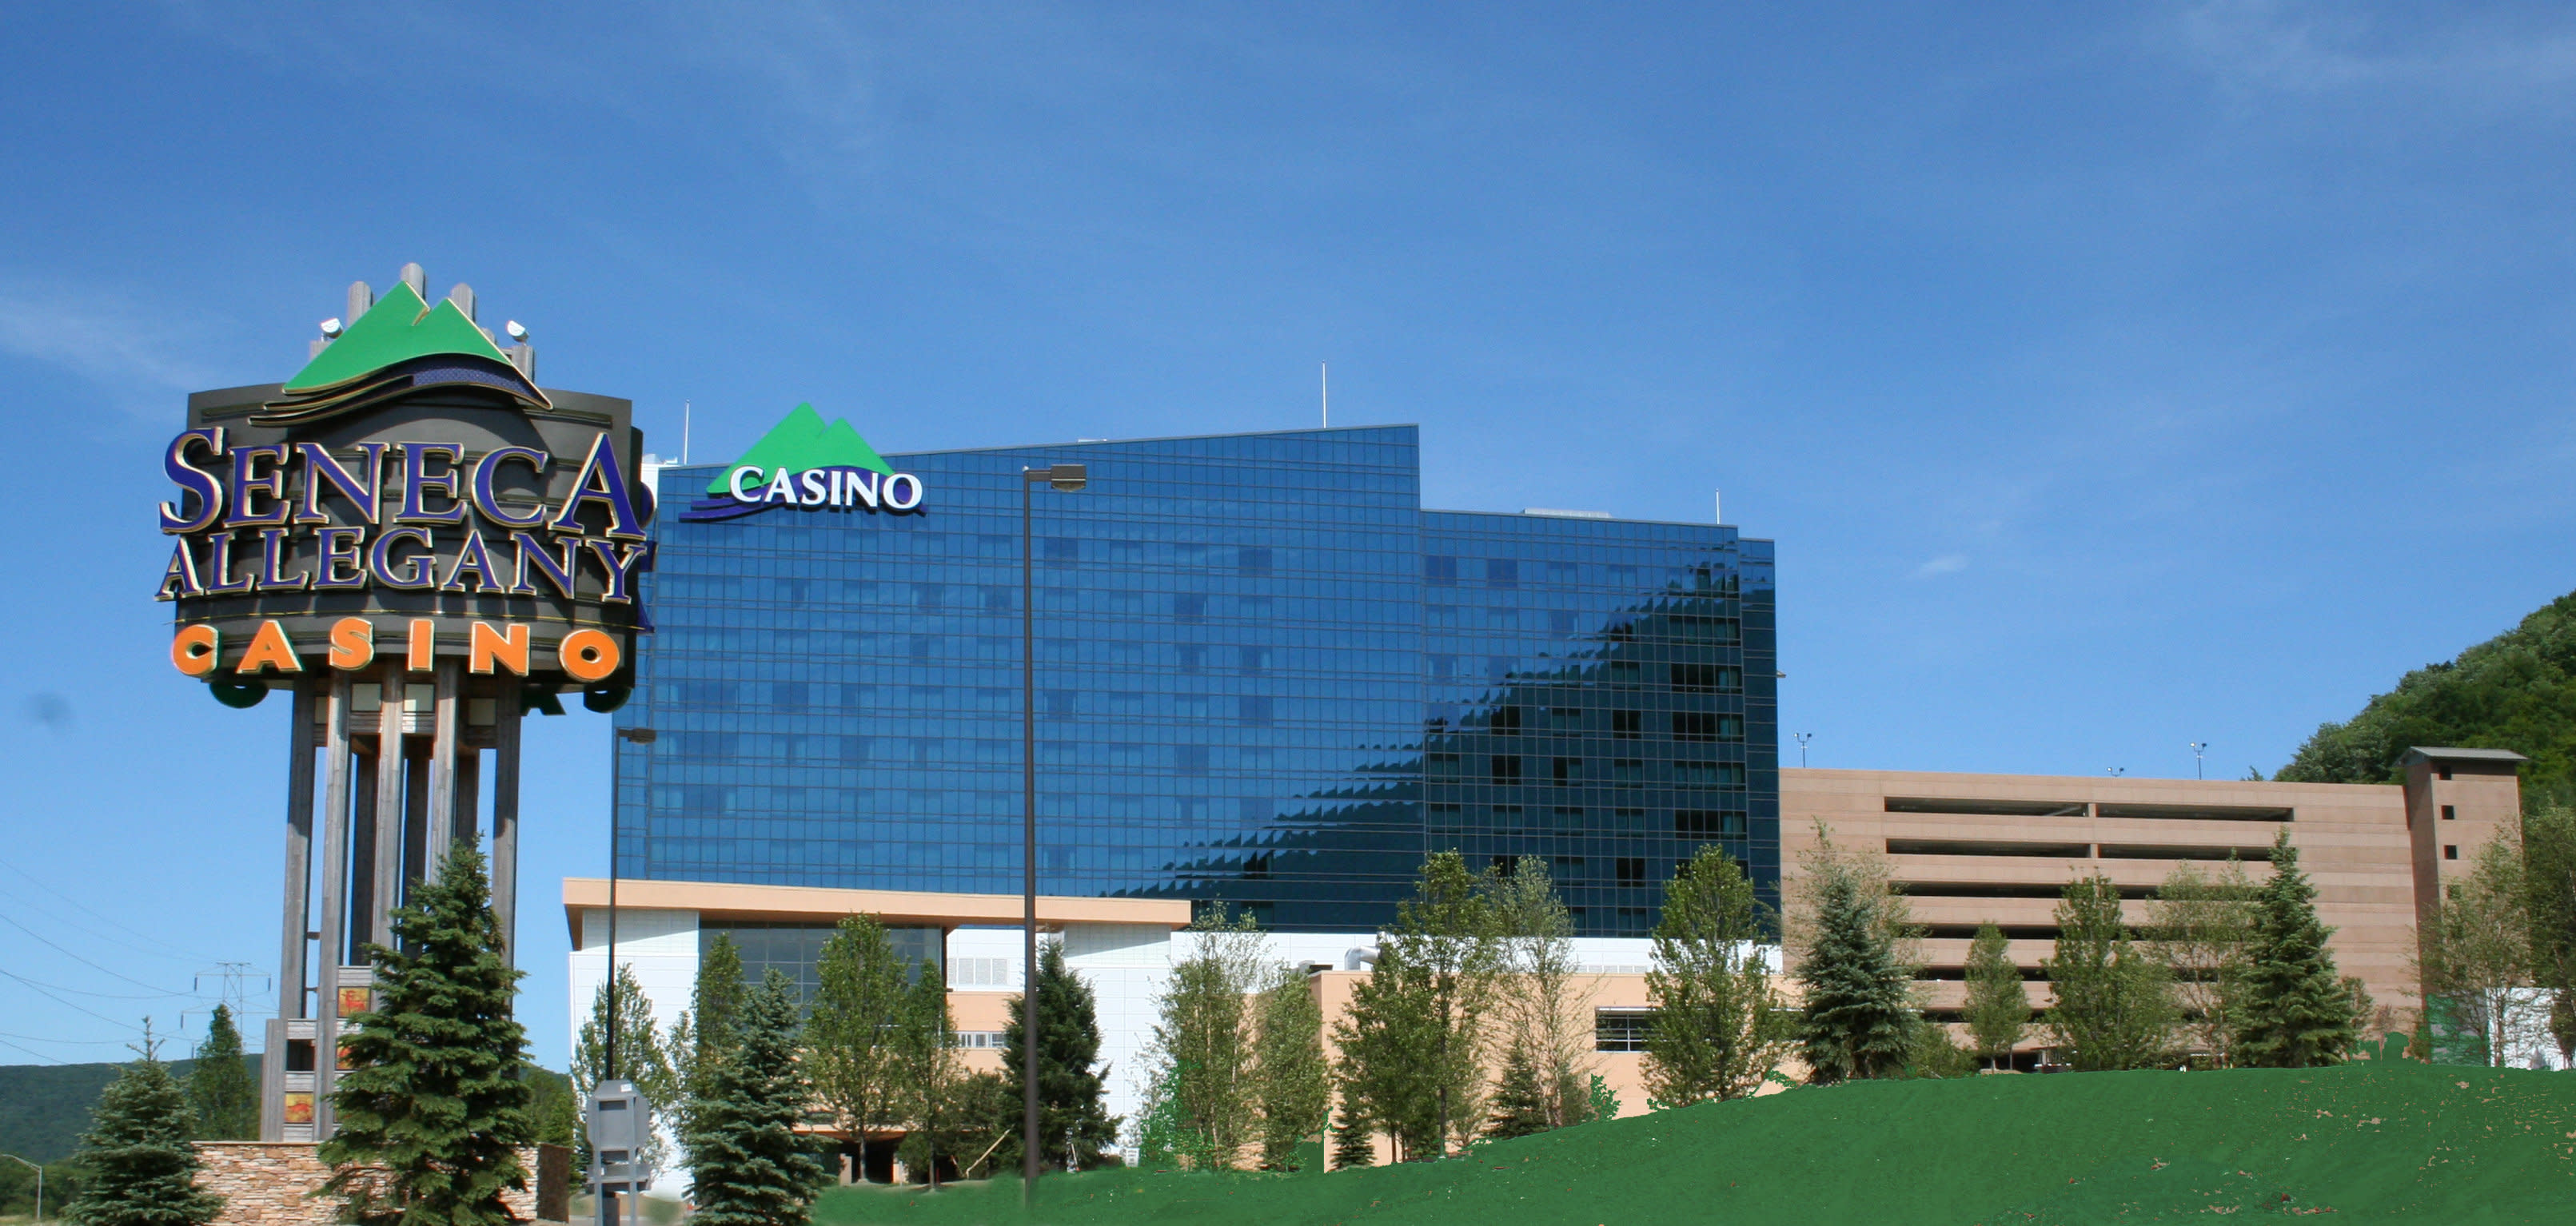 Allegheny casino new seneca york wisconsin gambling laws poker